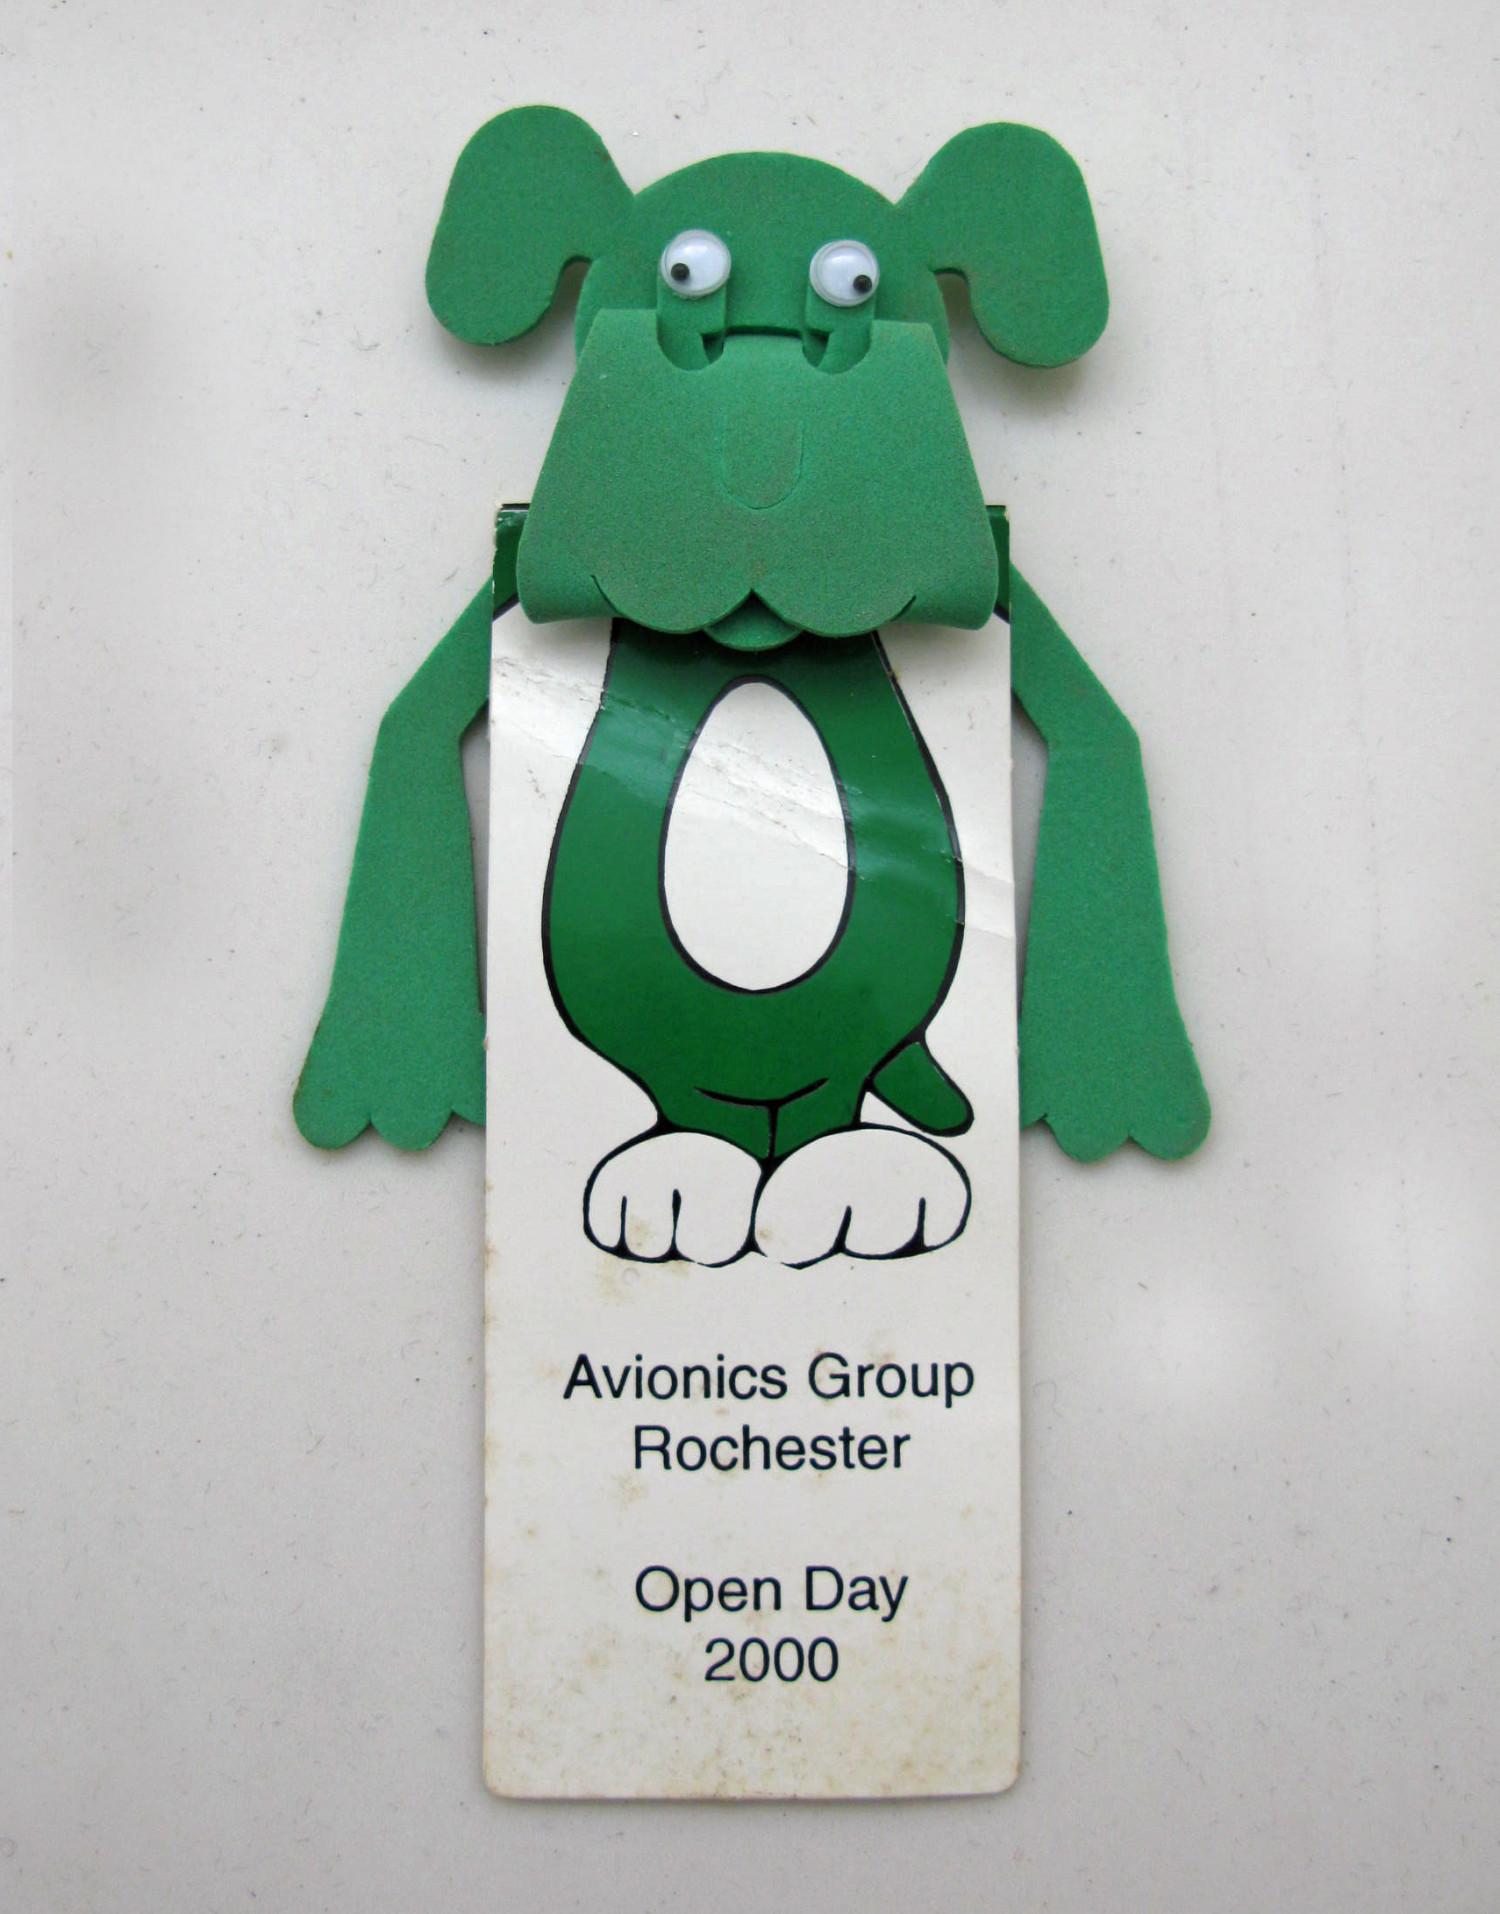 Open Day 2000, Green Hound Novelty